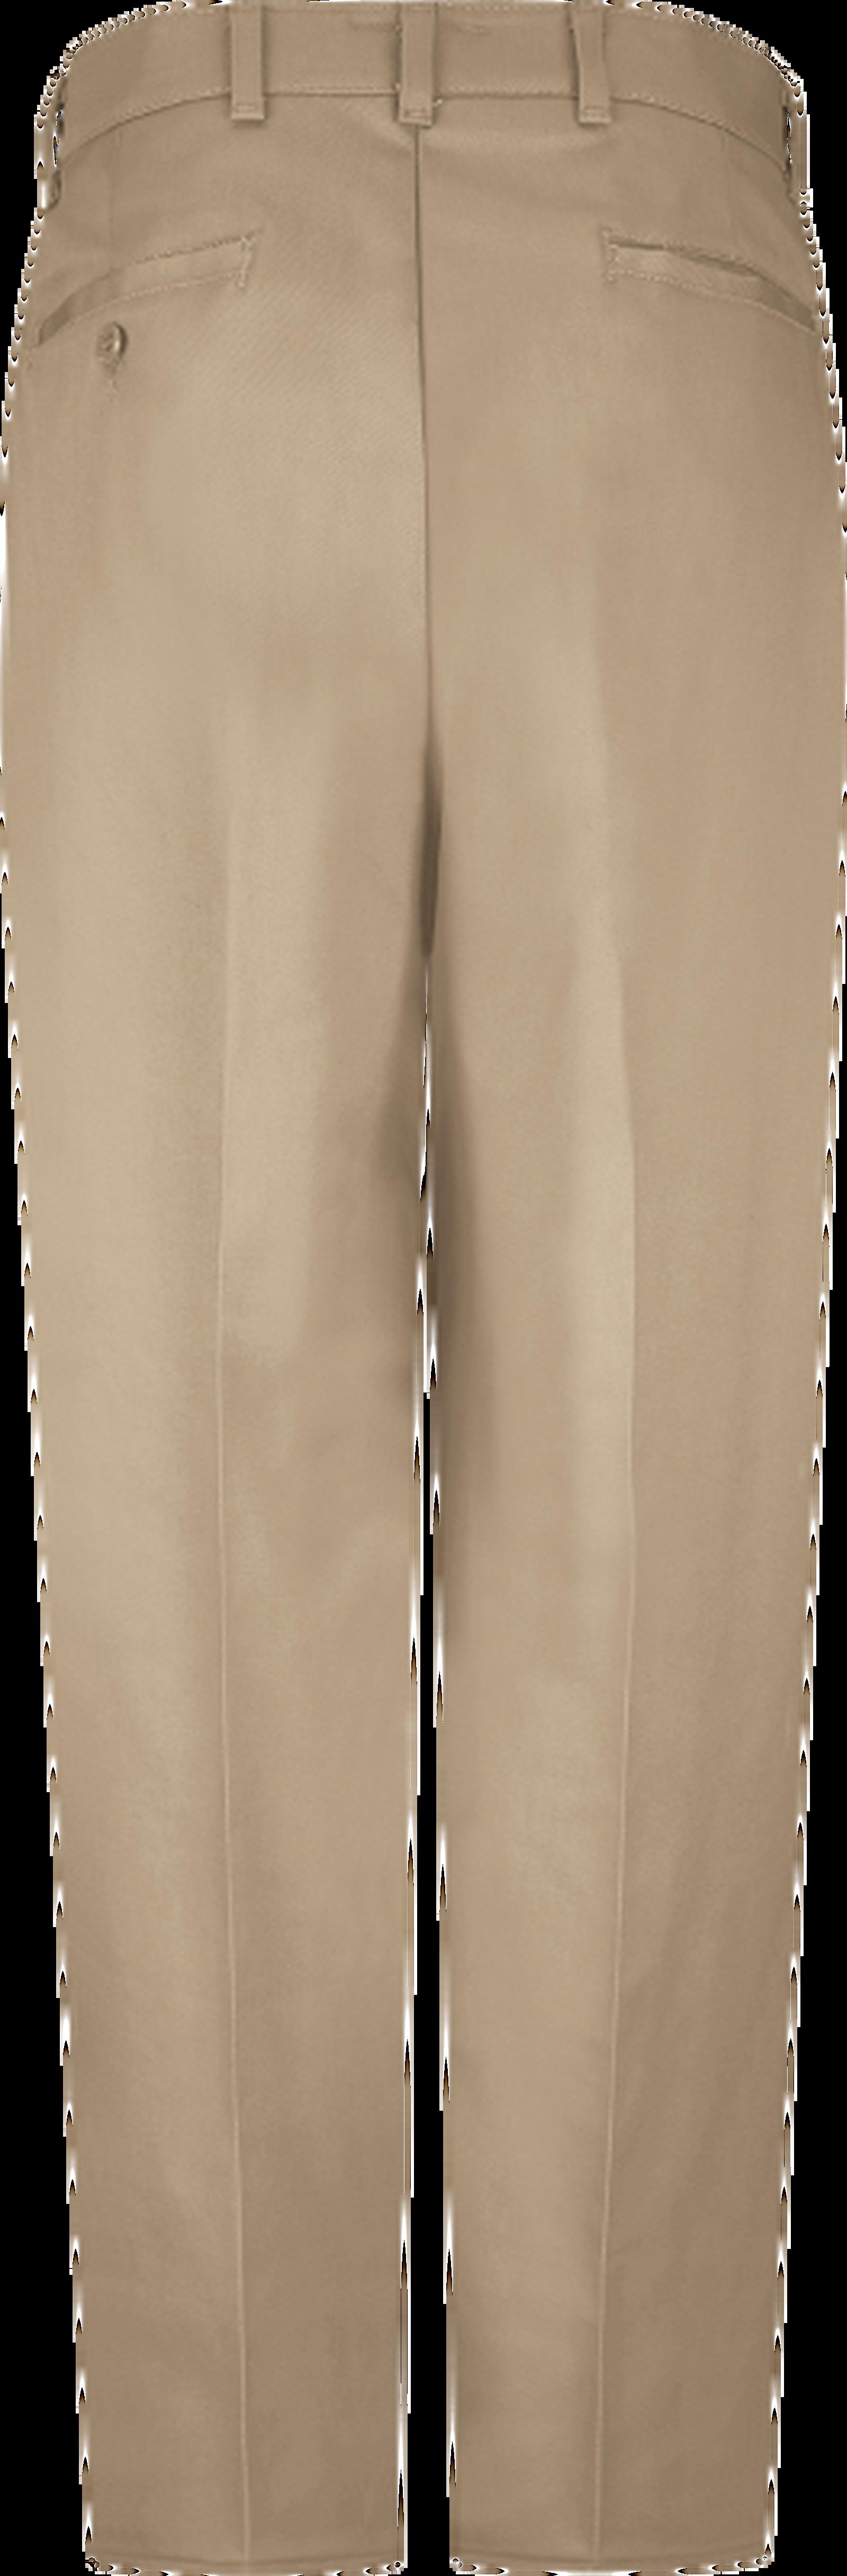 Men's Wrinkle-Resistant Cotton Work Pant